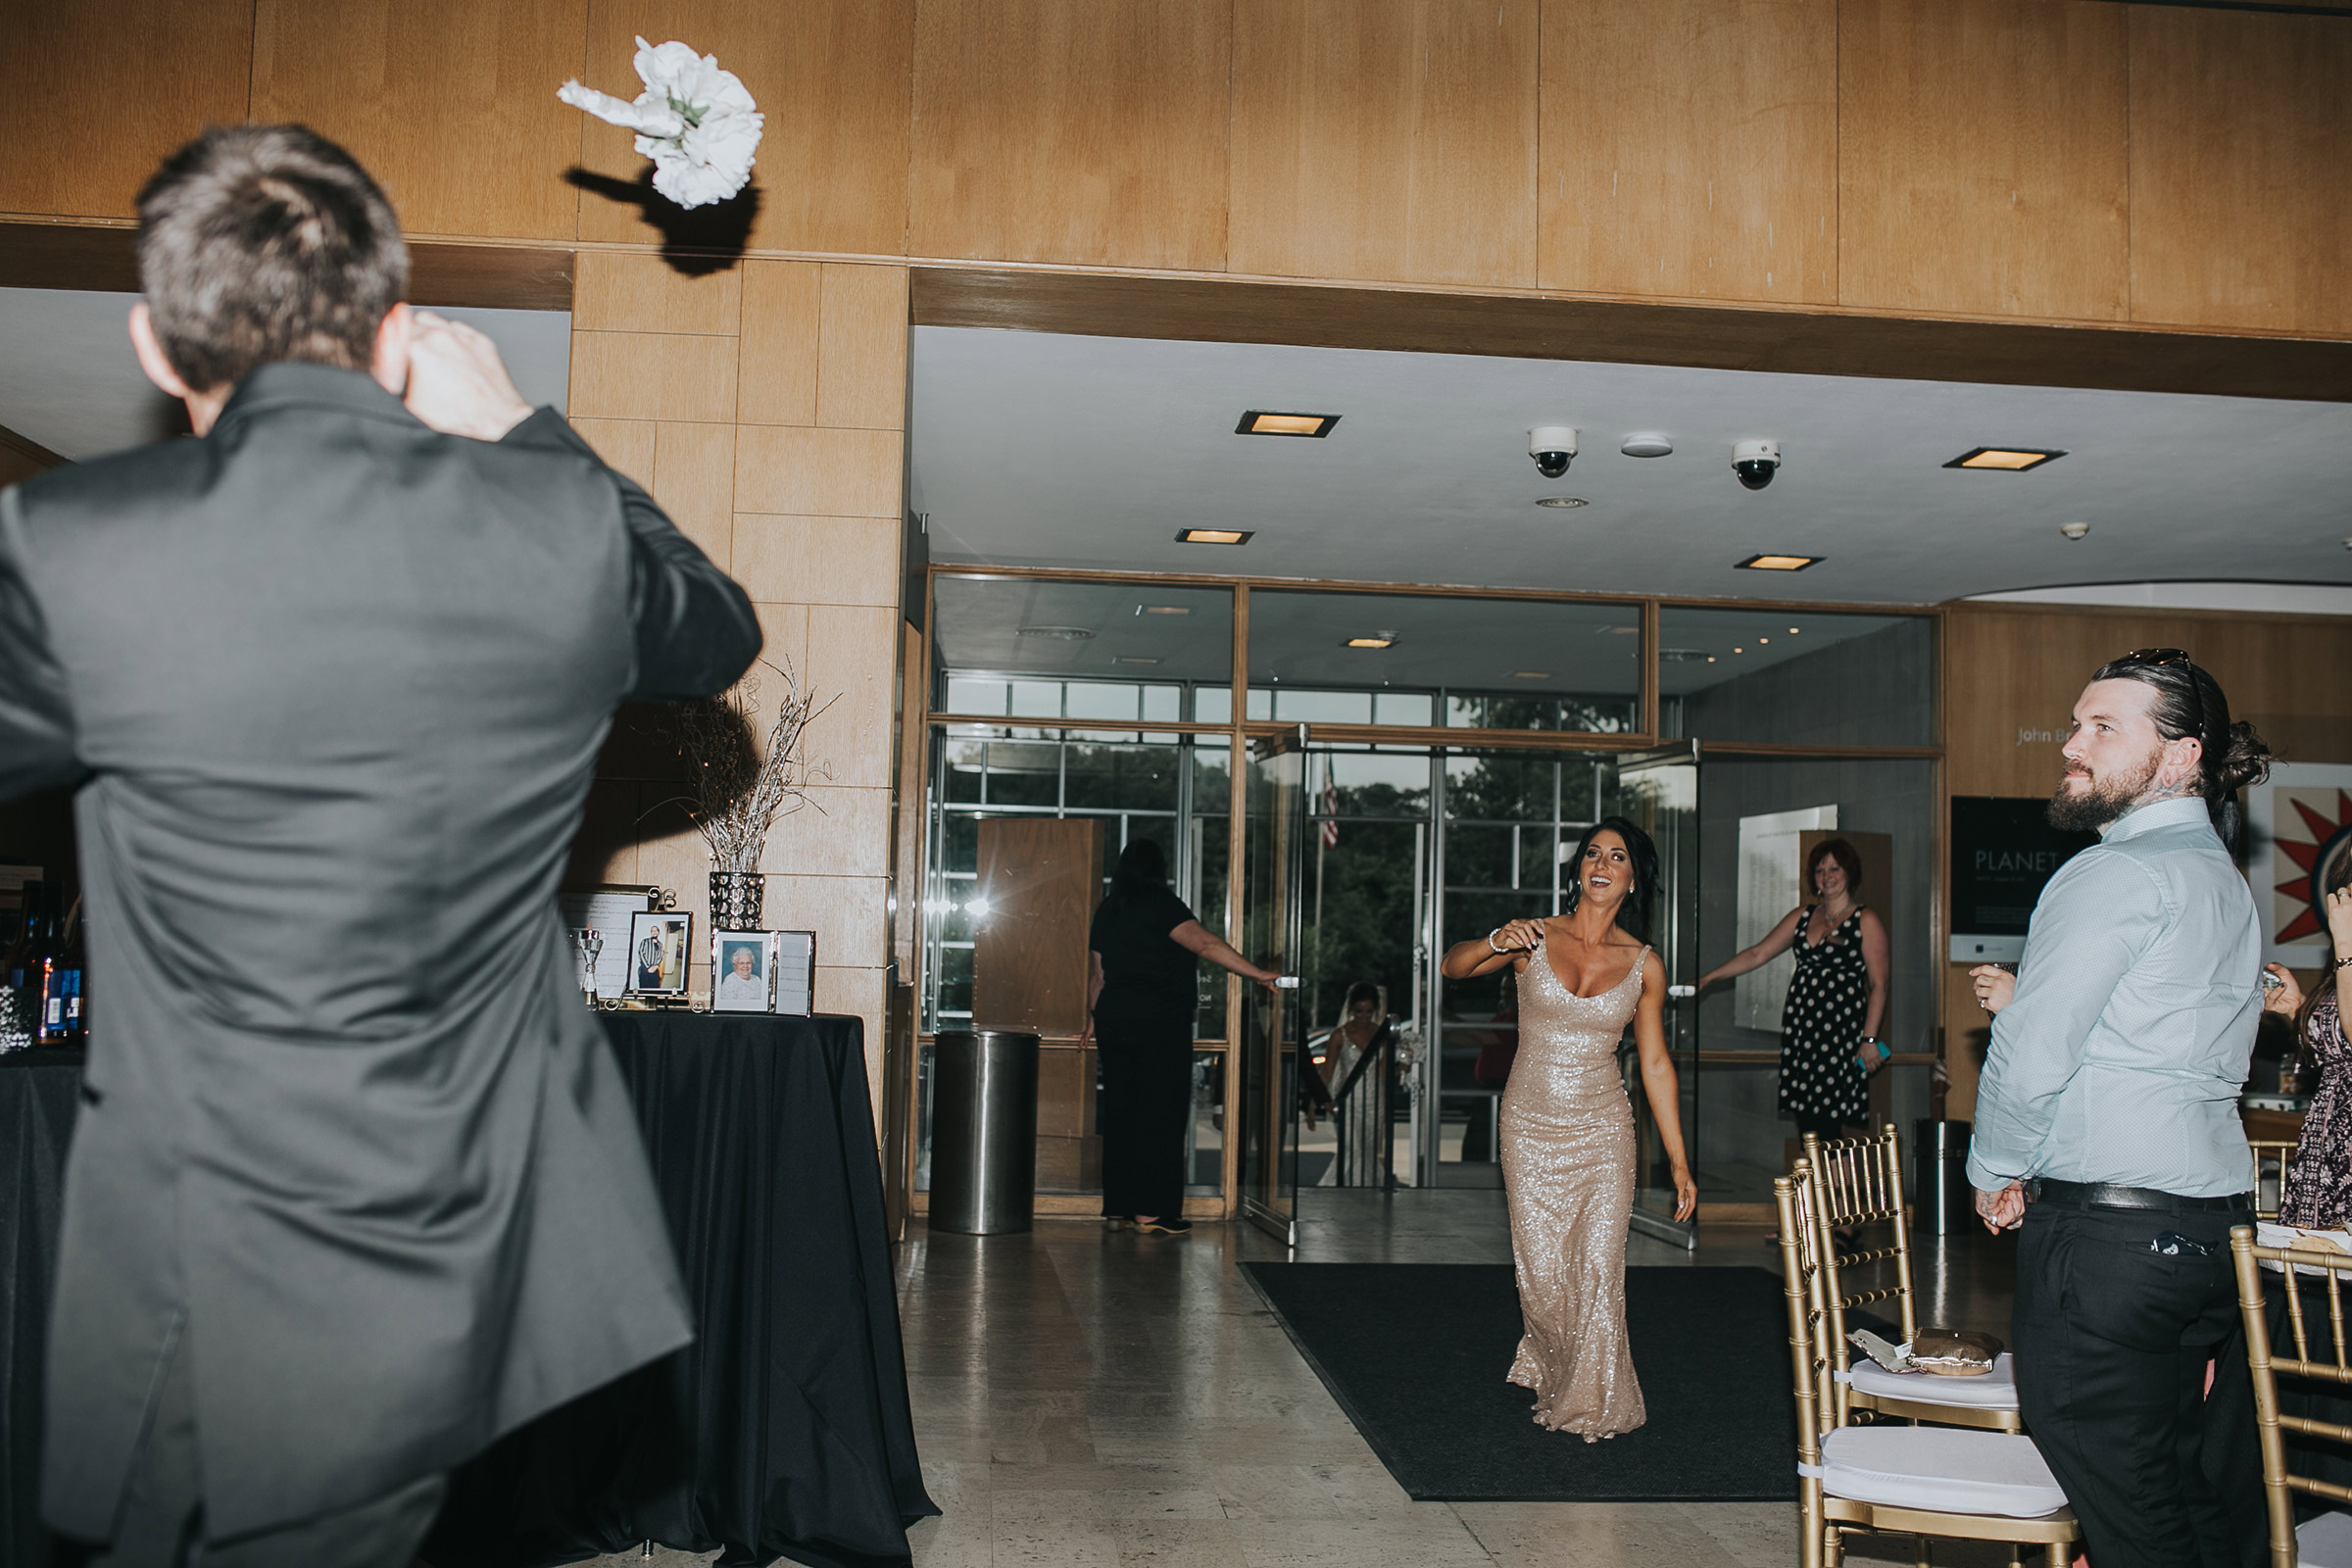 maid-of-honor-throwing-bouquet-grand-enterance-desmoines-iowa-art-center-raelyn-ramey-photography.jpg